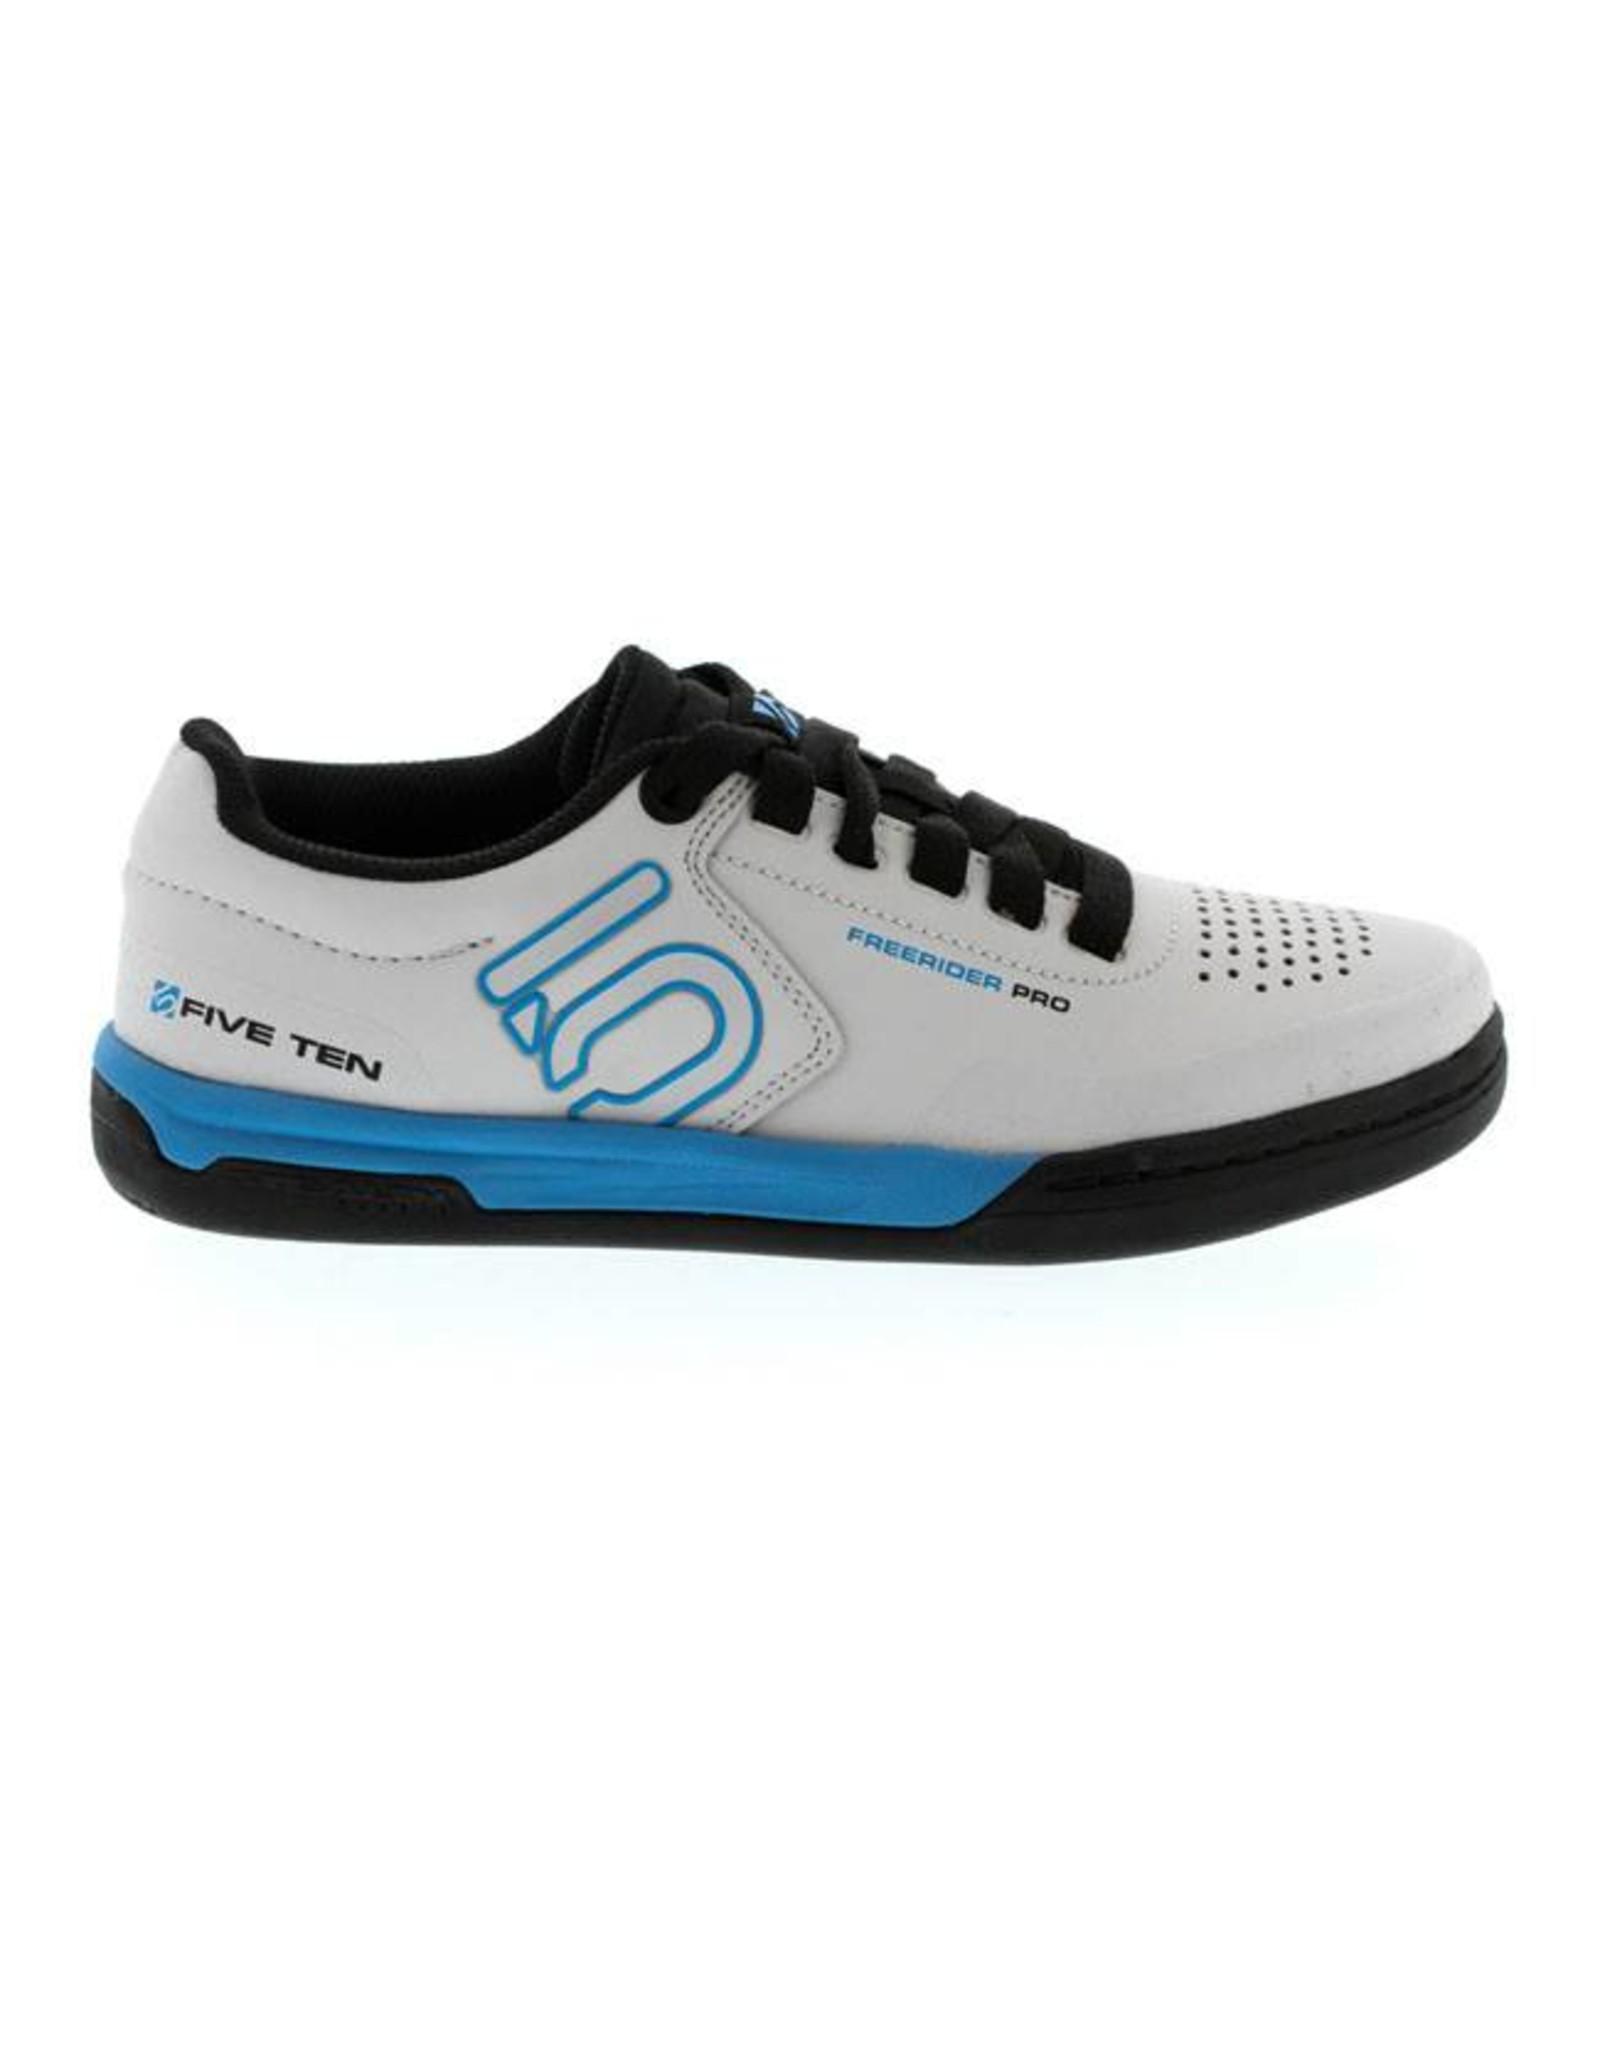 Five Ten Five Ten Freerider Pro Women's Flat Pedal Shoe Solid Gray 7